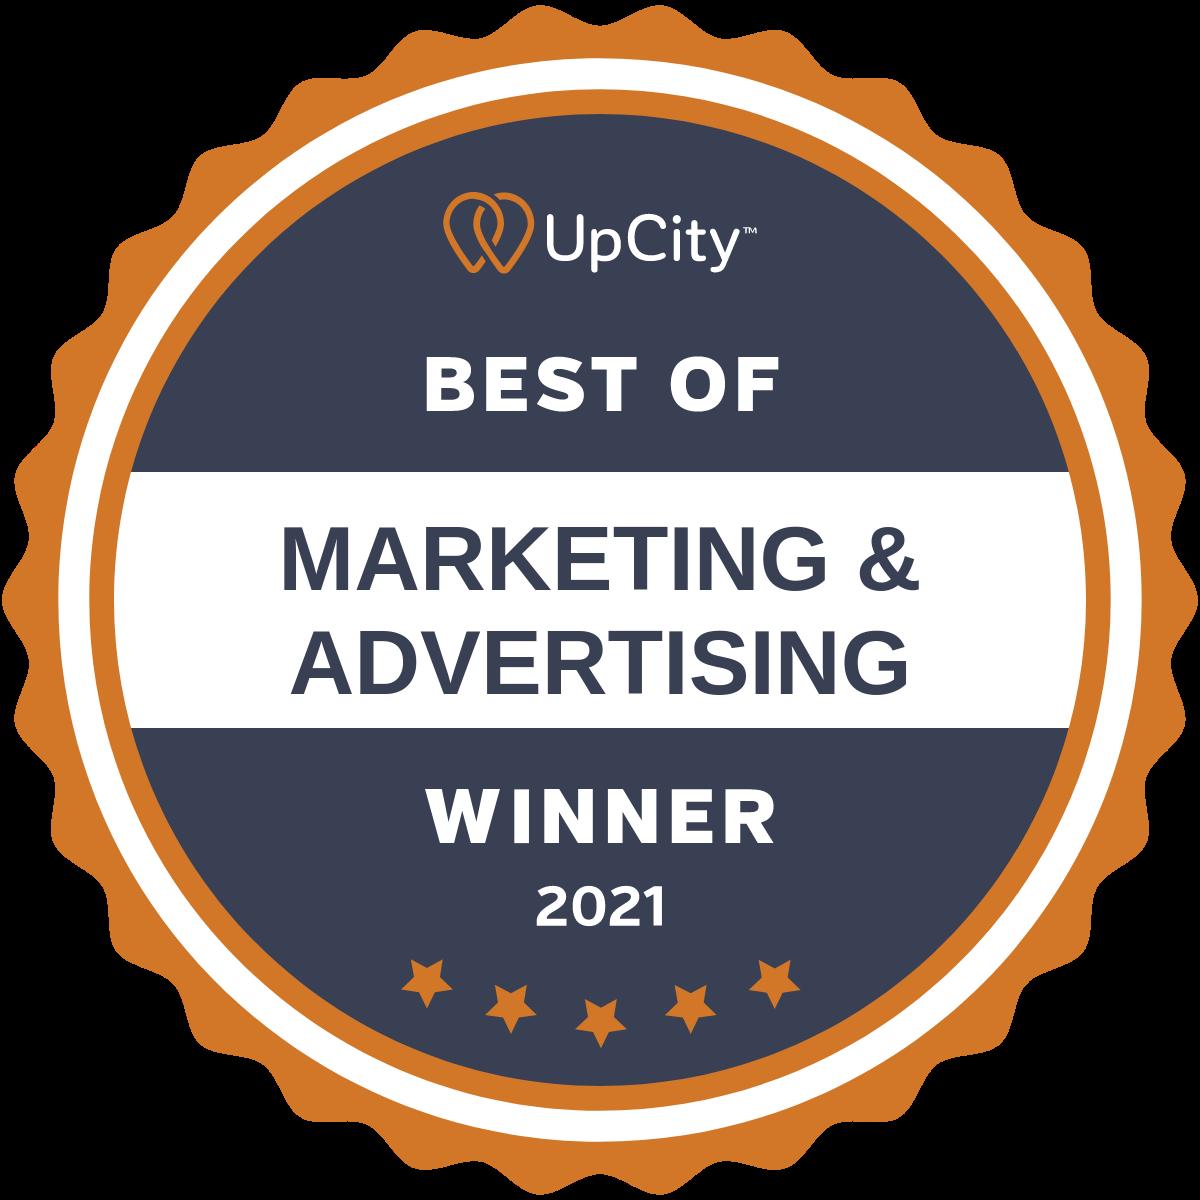 2021 Best of Marketing & Advertising